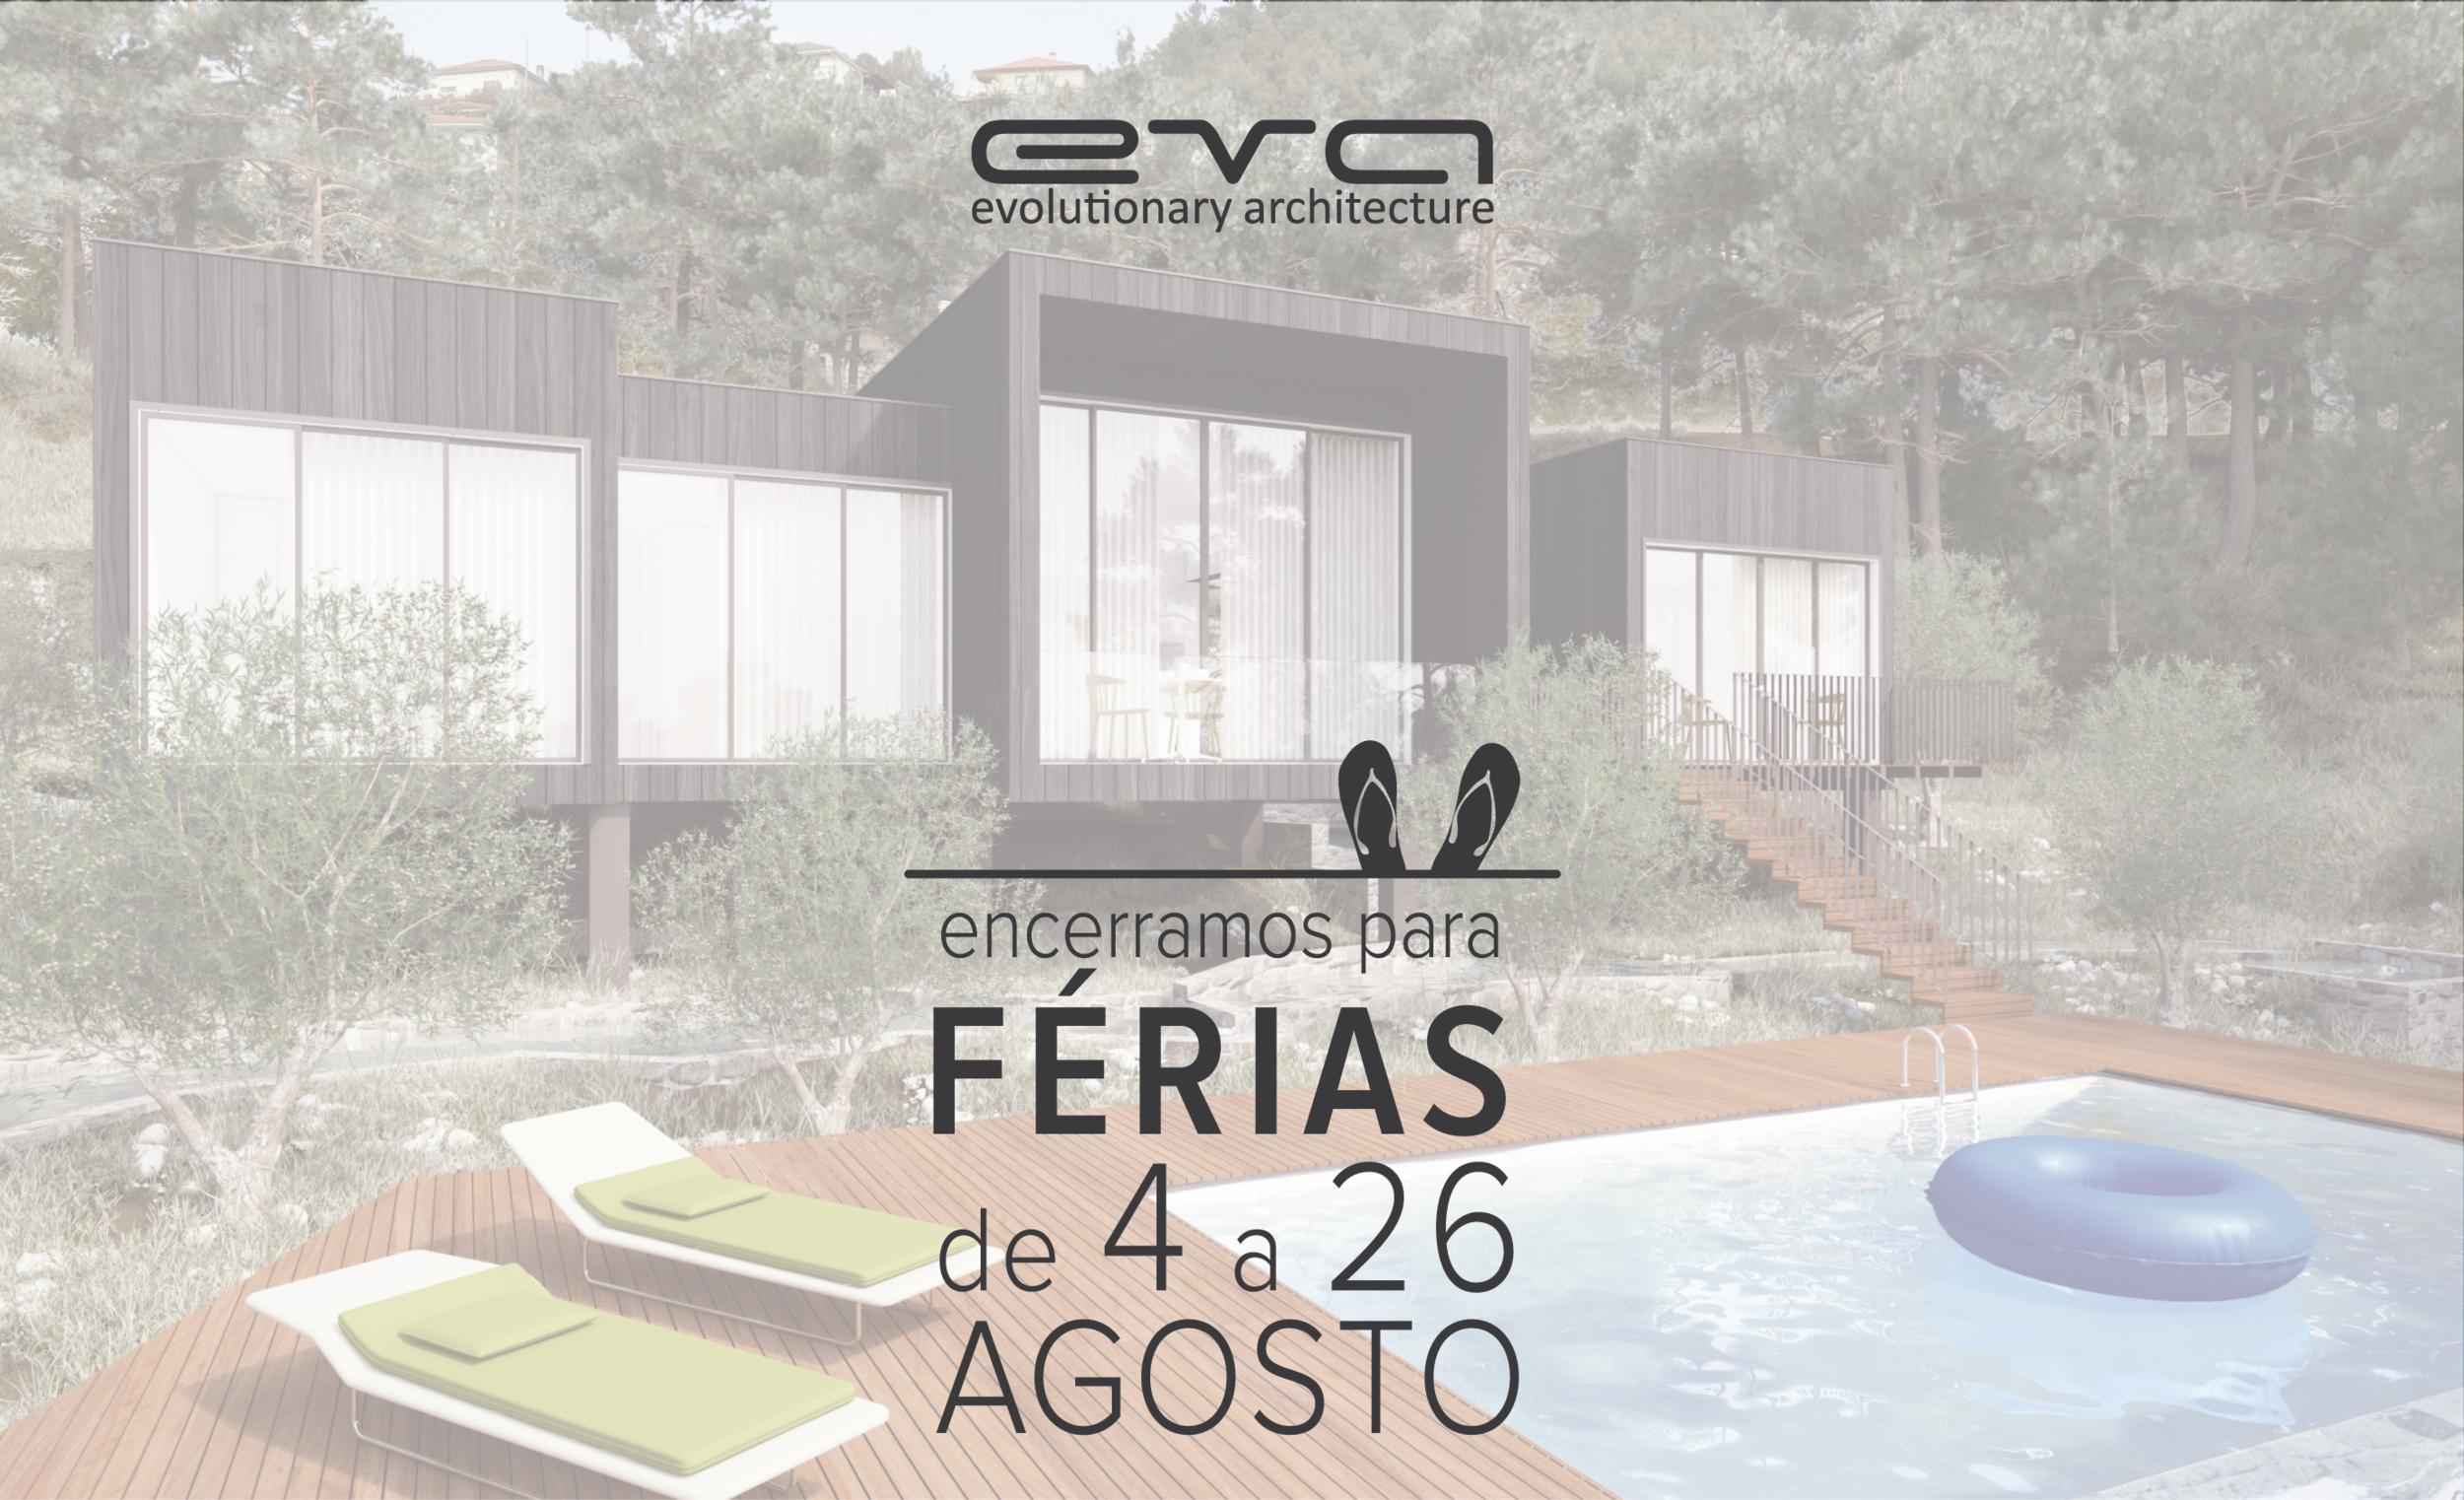 EVA atelier - periodo ferias 2018 - arquitectos porto.png